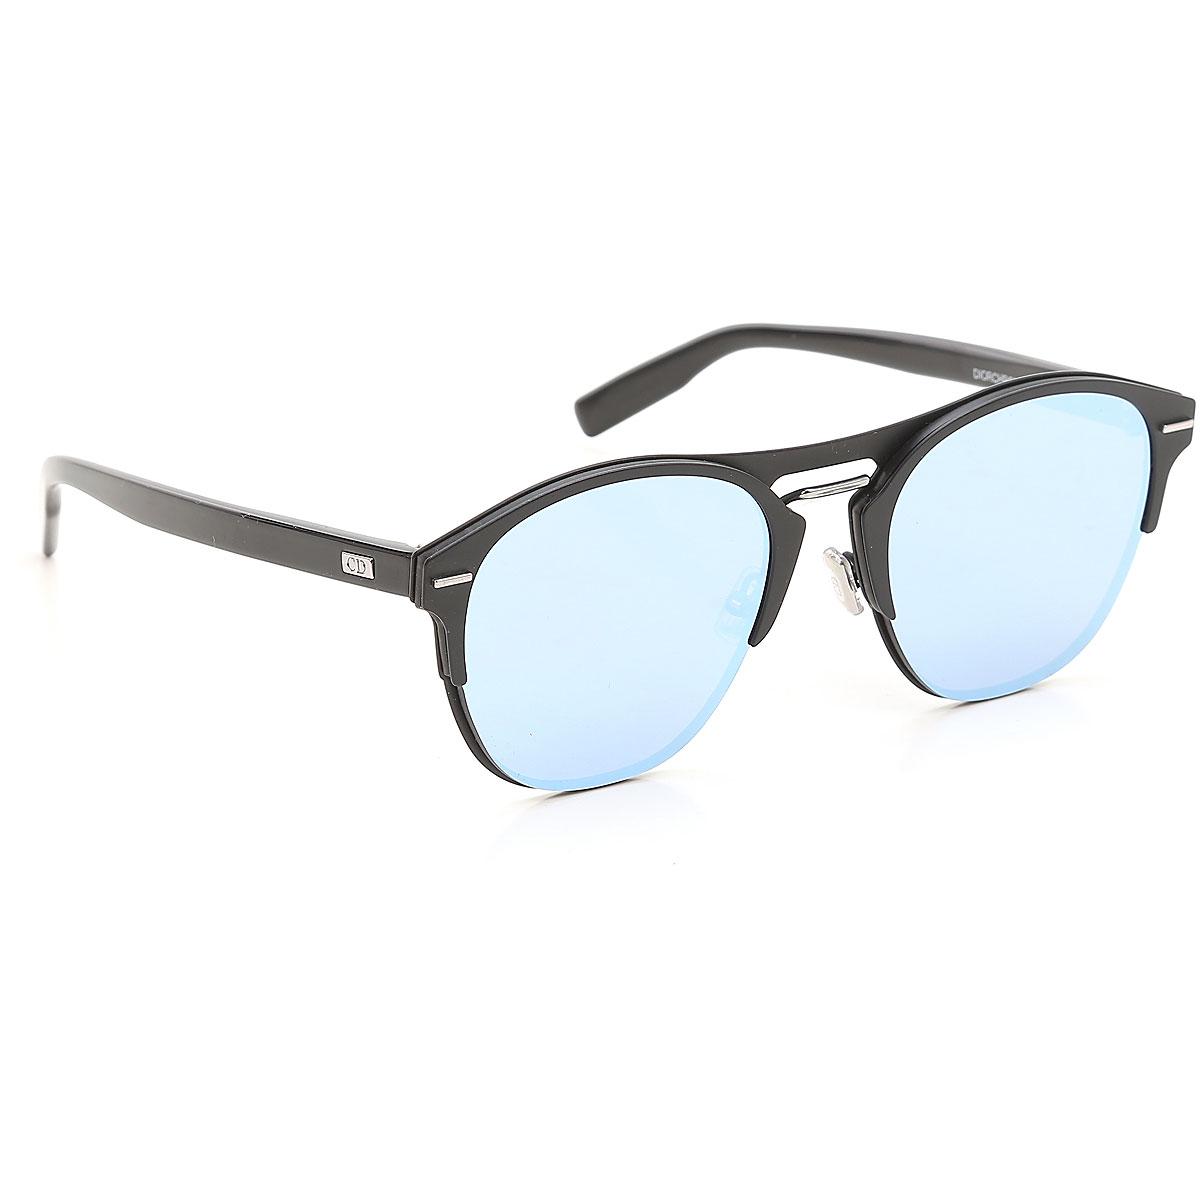 95d251aac70c Sunglasses Christian Dior